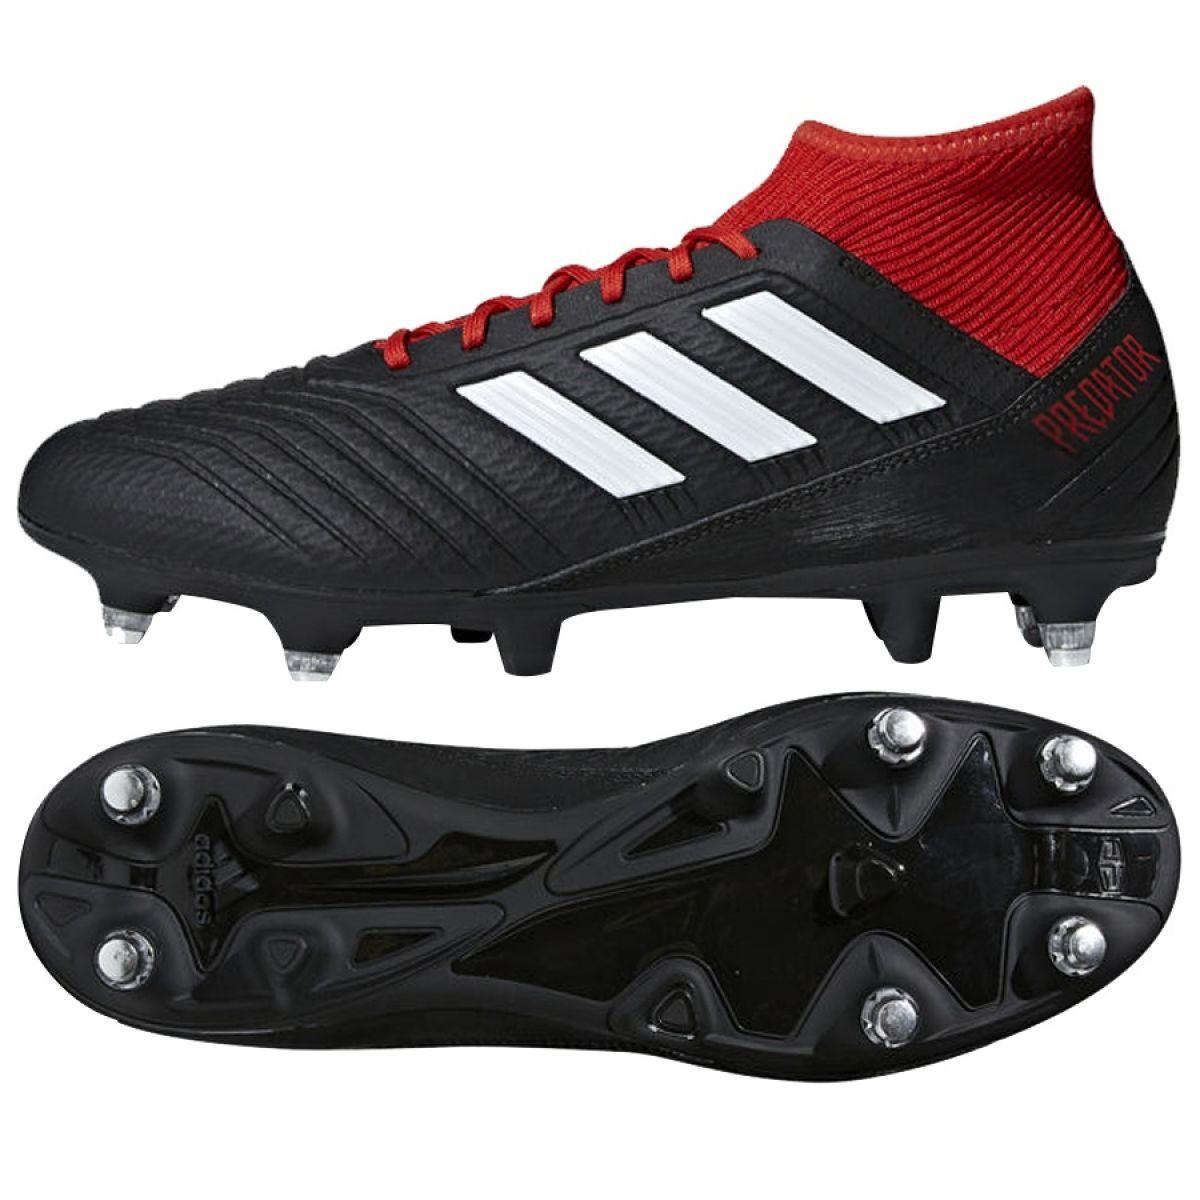 adidas Predator 18.3 SG Sports et Loisirs Homme Chaussures